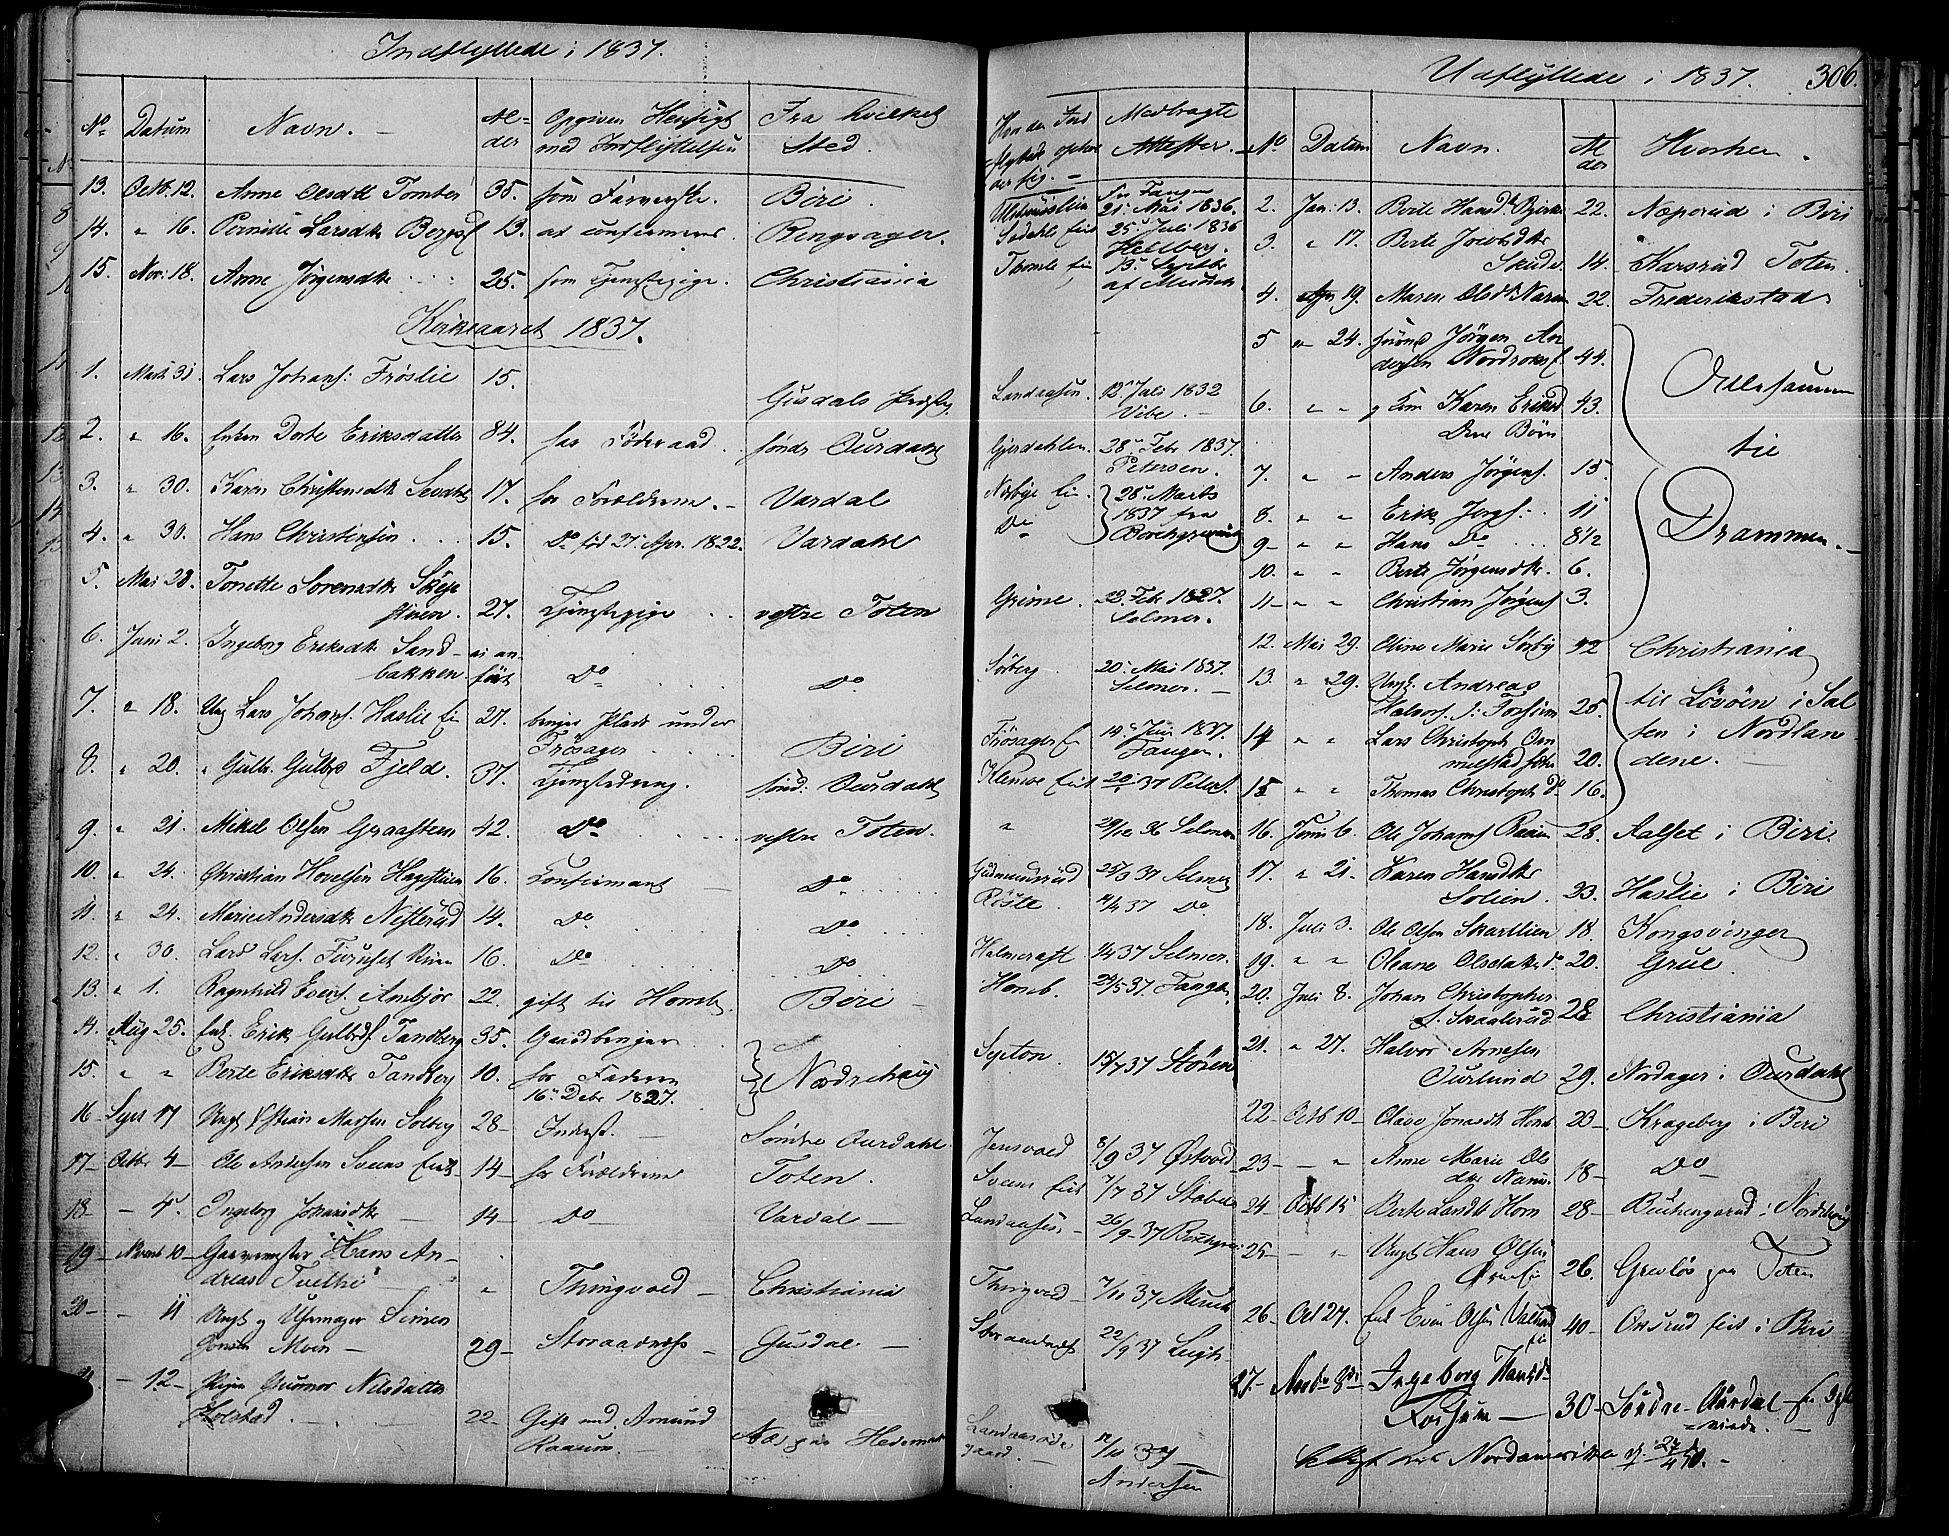 SAH, Land prestekontor, Ministerialbok nr. 8, 1830-1846, s. 306